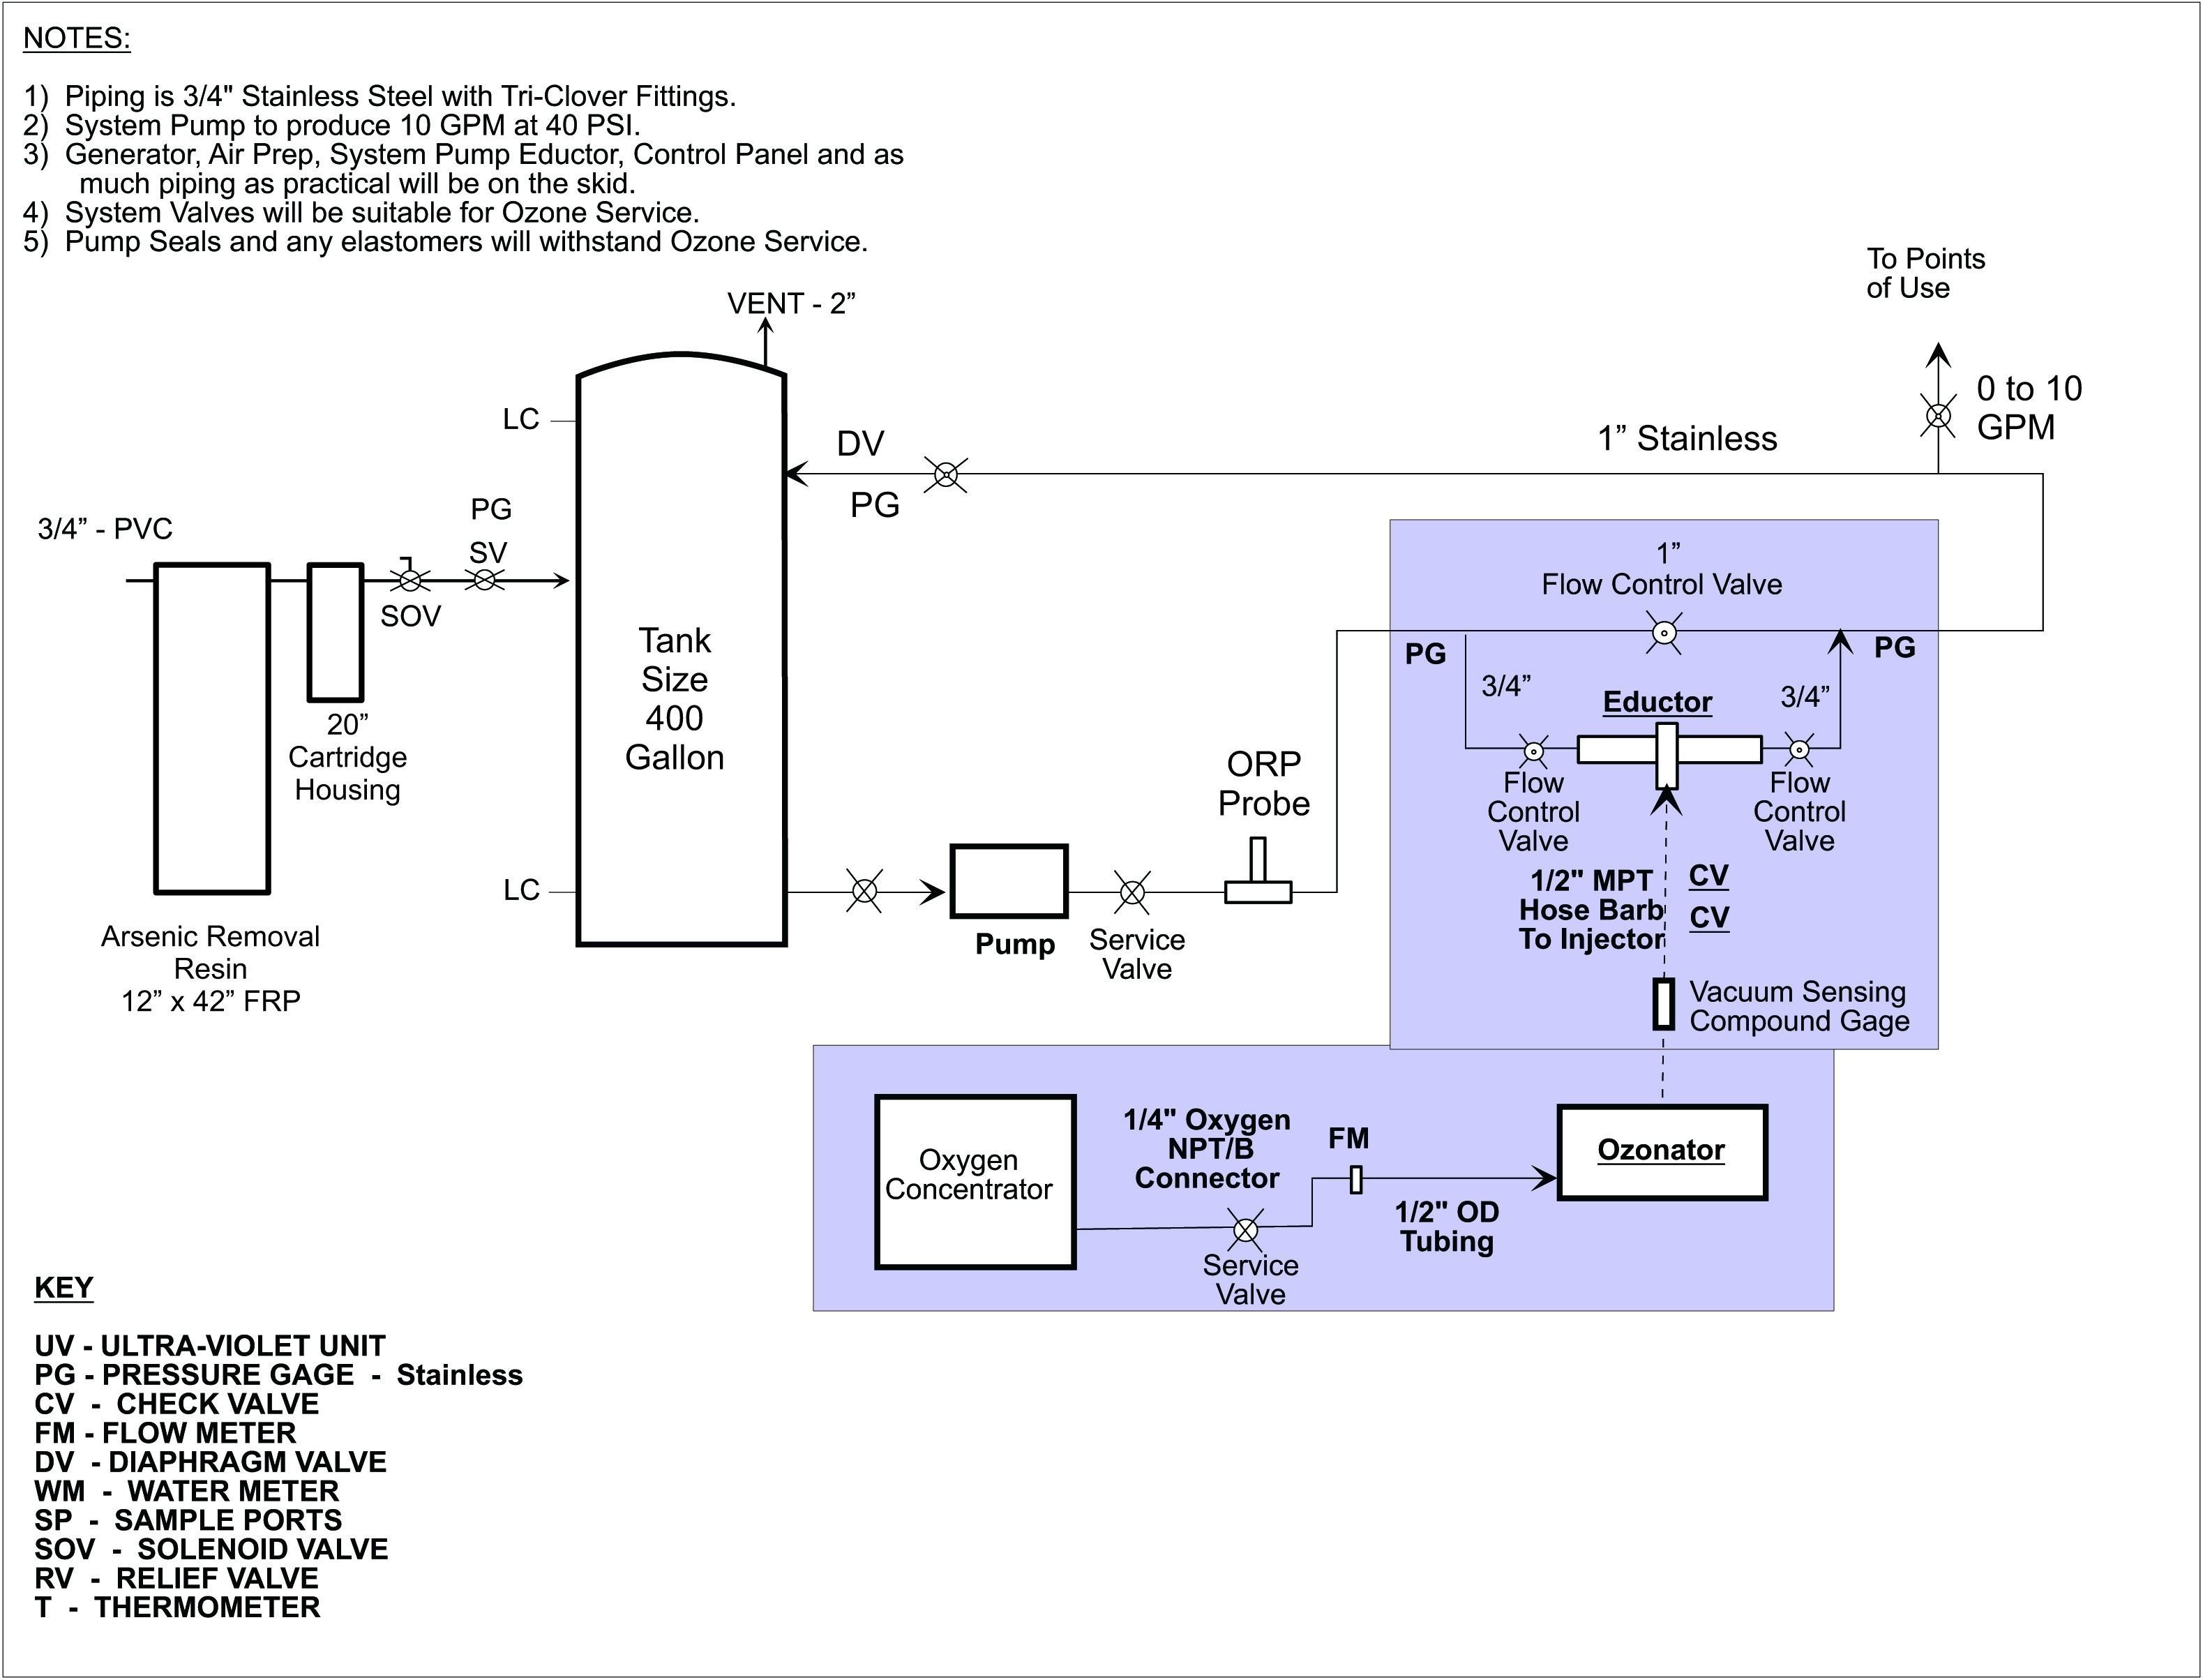 Control 4 Wiring Diagram Wiring Diagram for Wolf Generator Save Circuit Diagram Ozone Of Control 4 Wiring Diagram